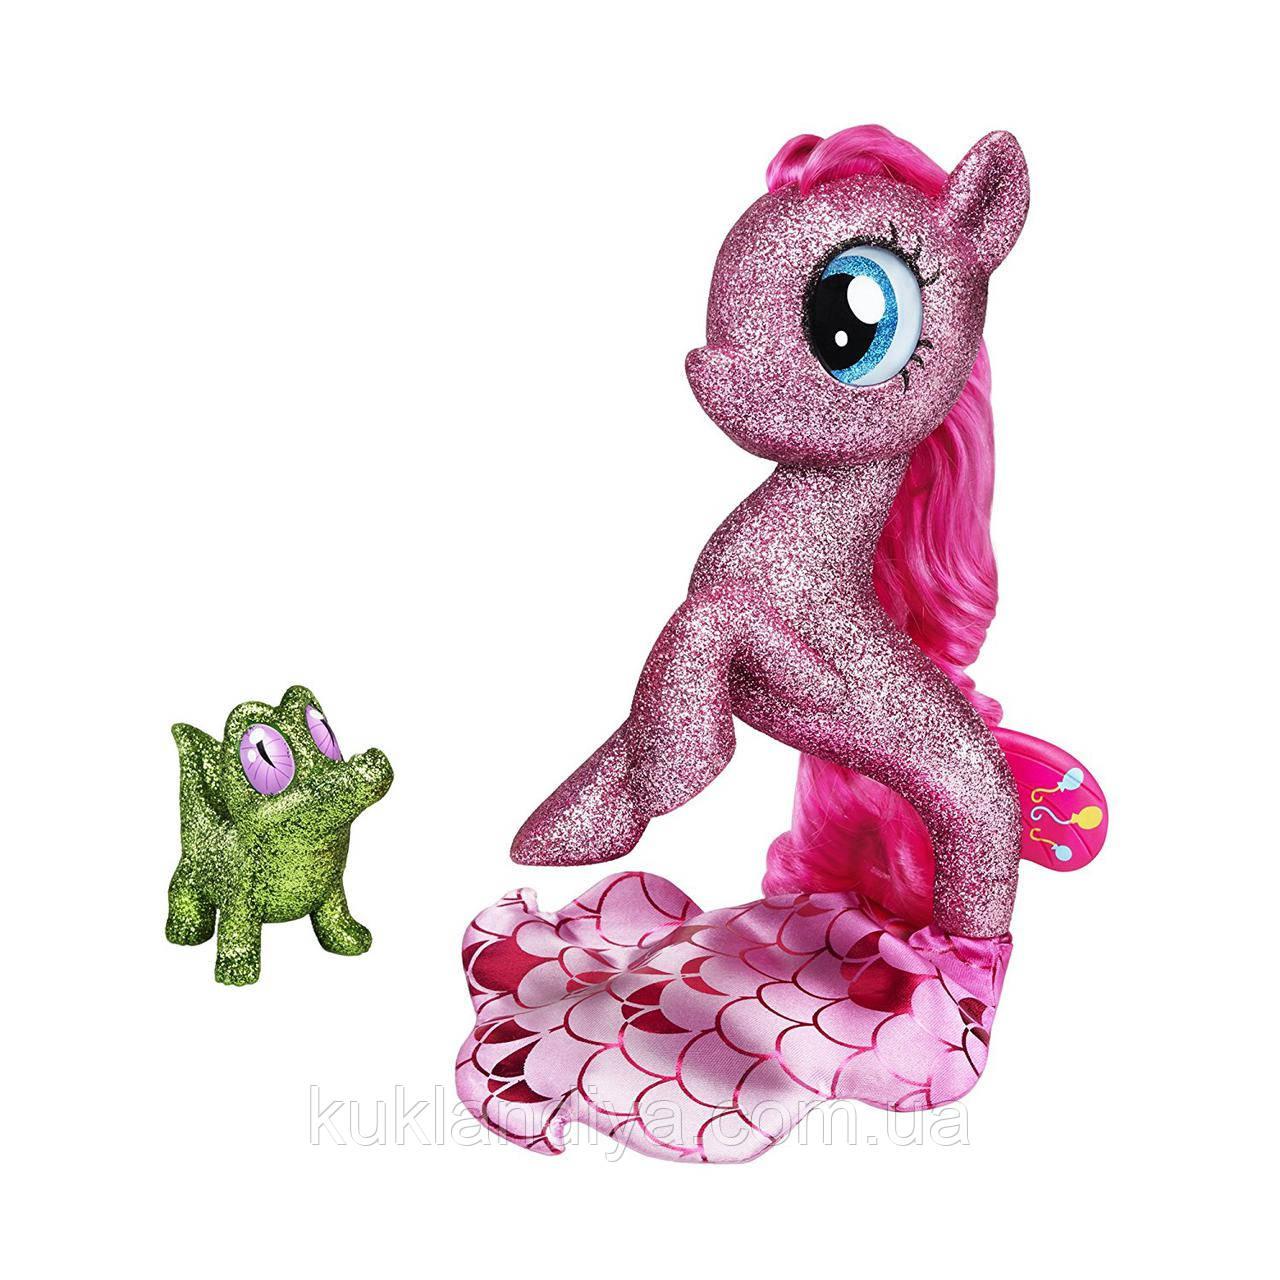 My Little Pony: The Movie глитерная Пинки Пай  русалочка с питомцем на светящейся подставке